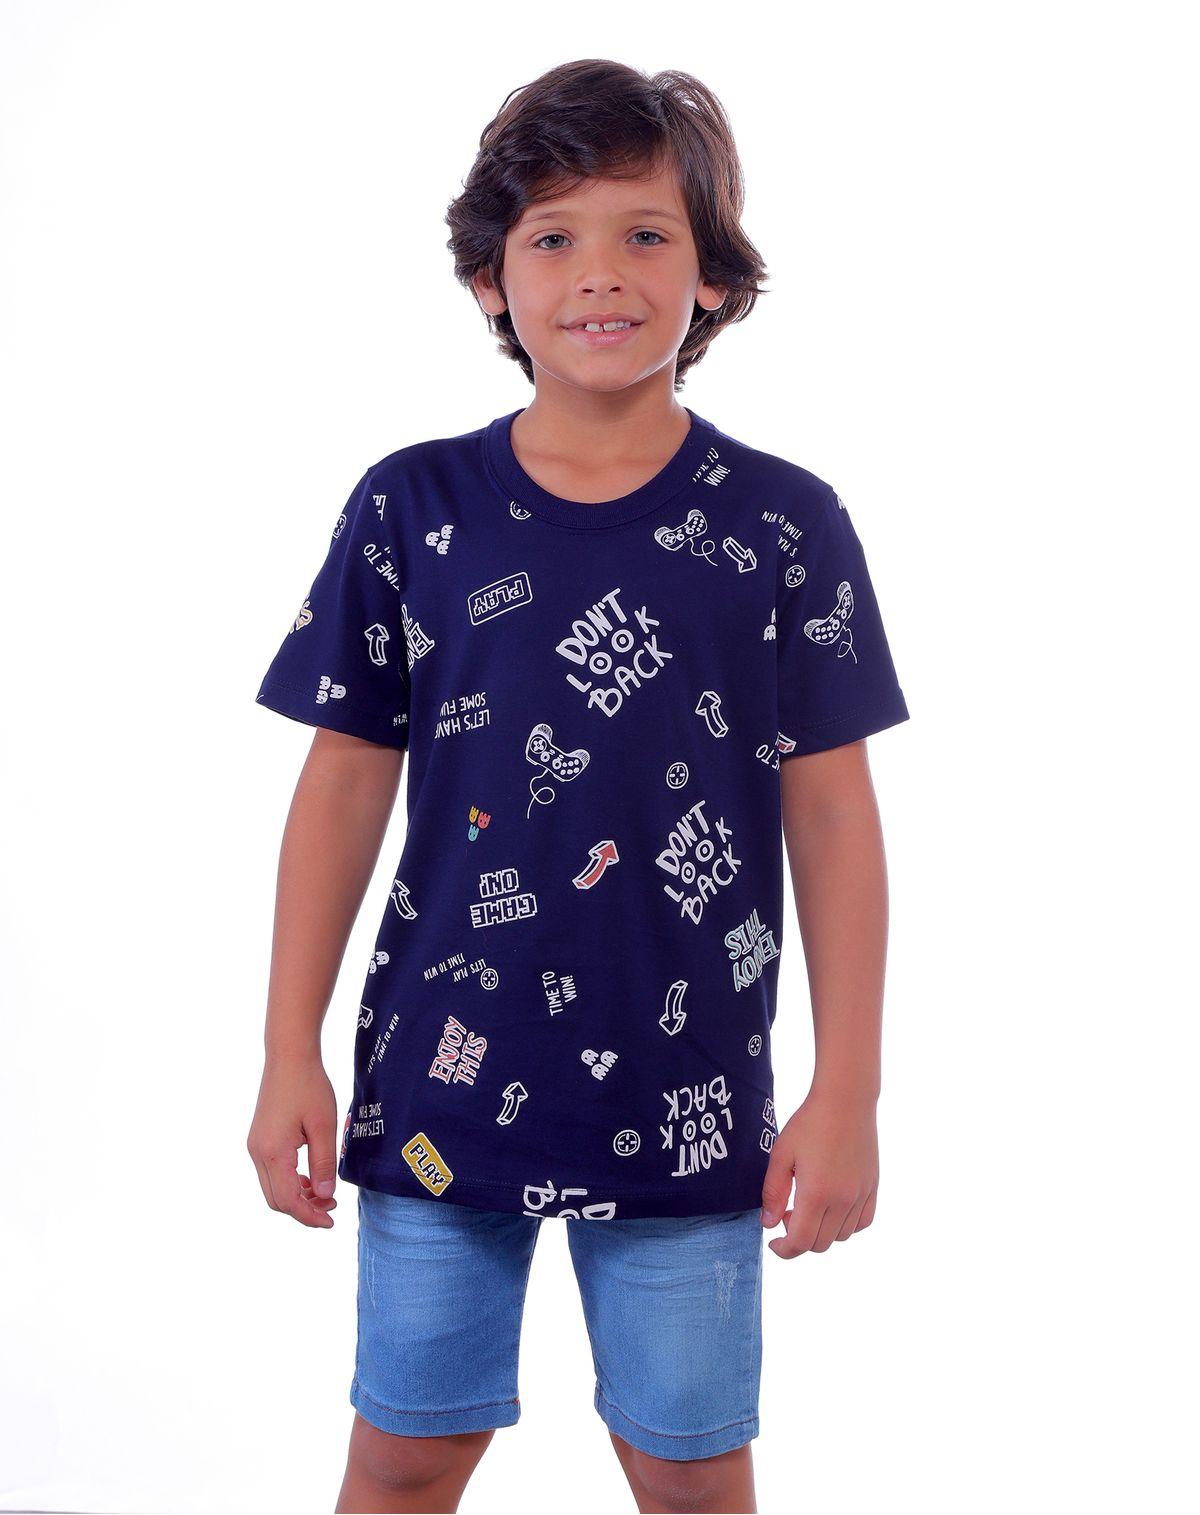 565428004-camiseta-manga-curta-infantil-menino-estampa-game-marinho-10-6bb